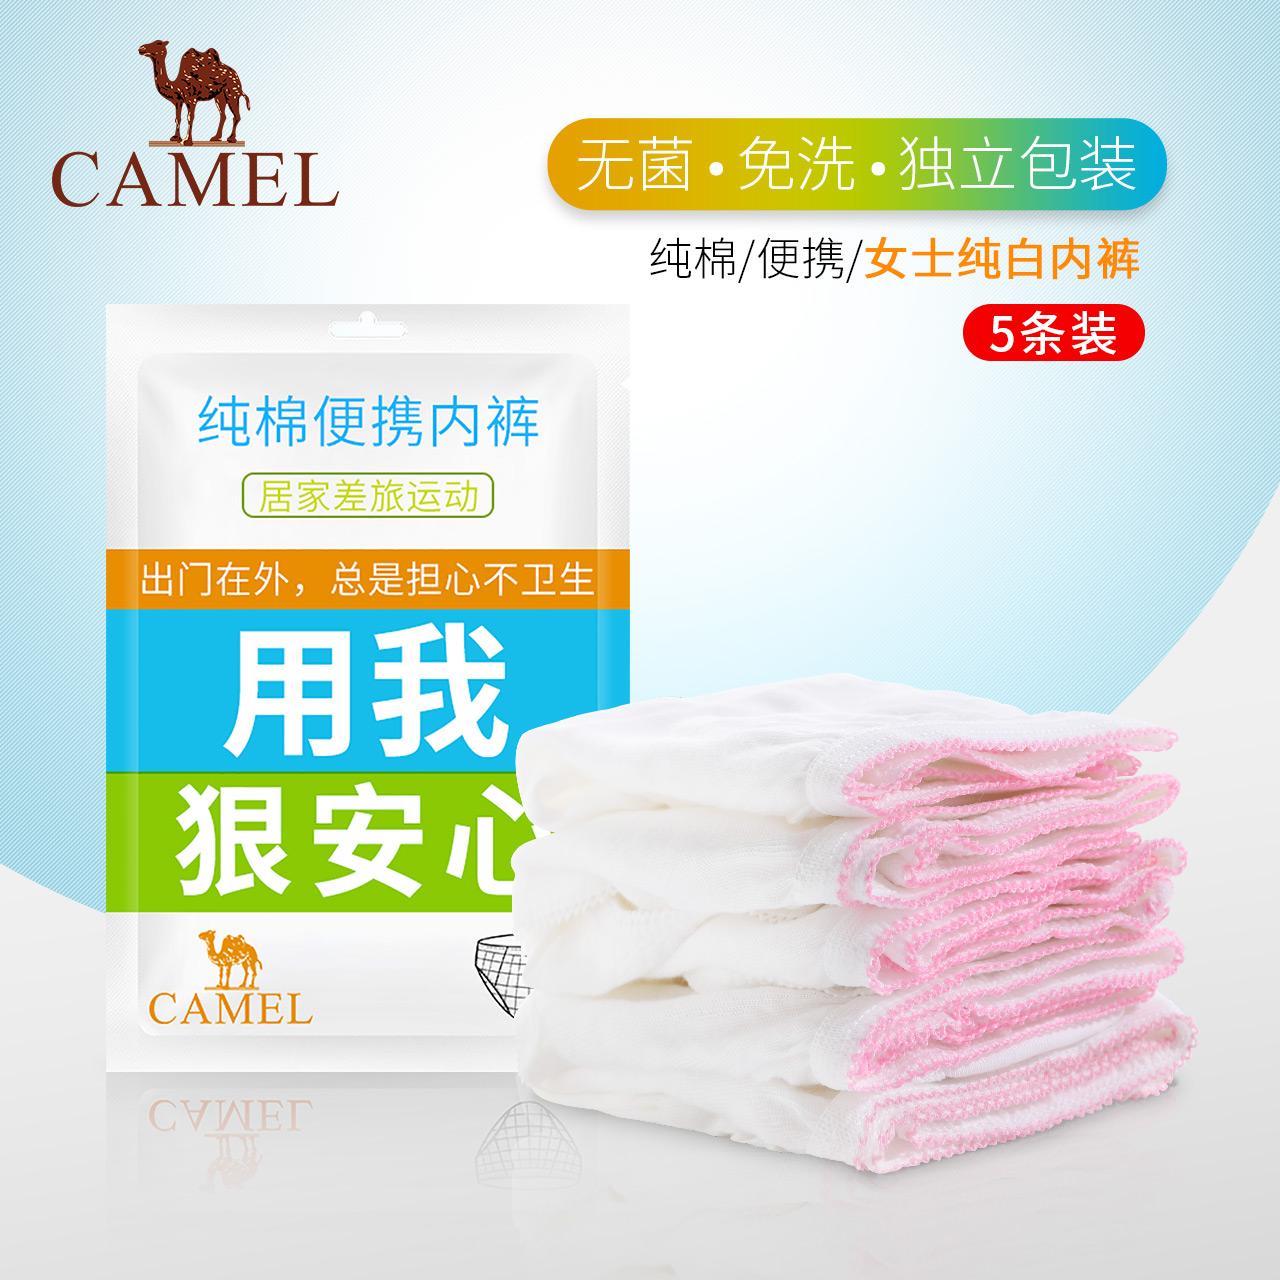 Camel 骆驼 男女纯棉一次性内裤 5条*2件 天猫优惠券折后¥17包邮